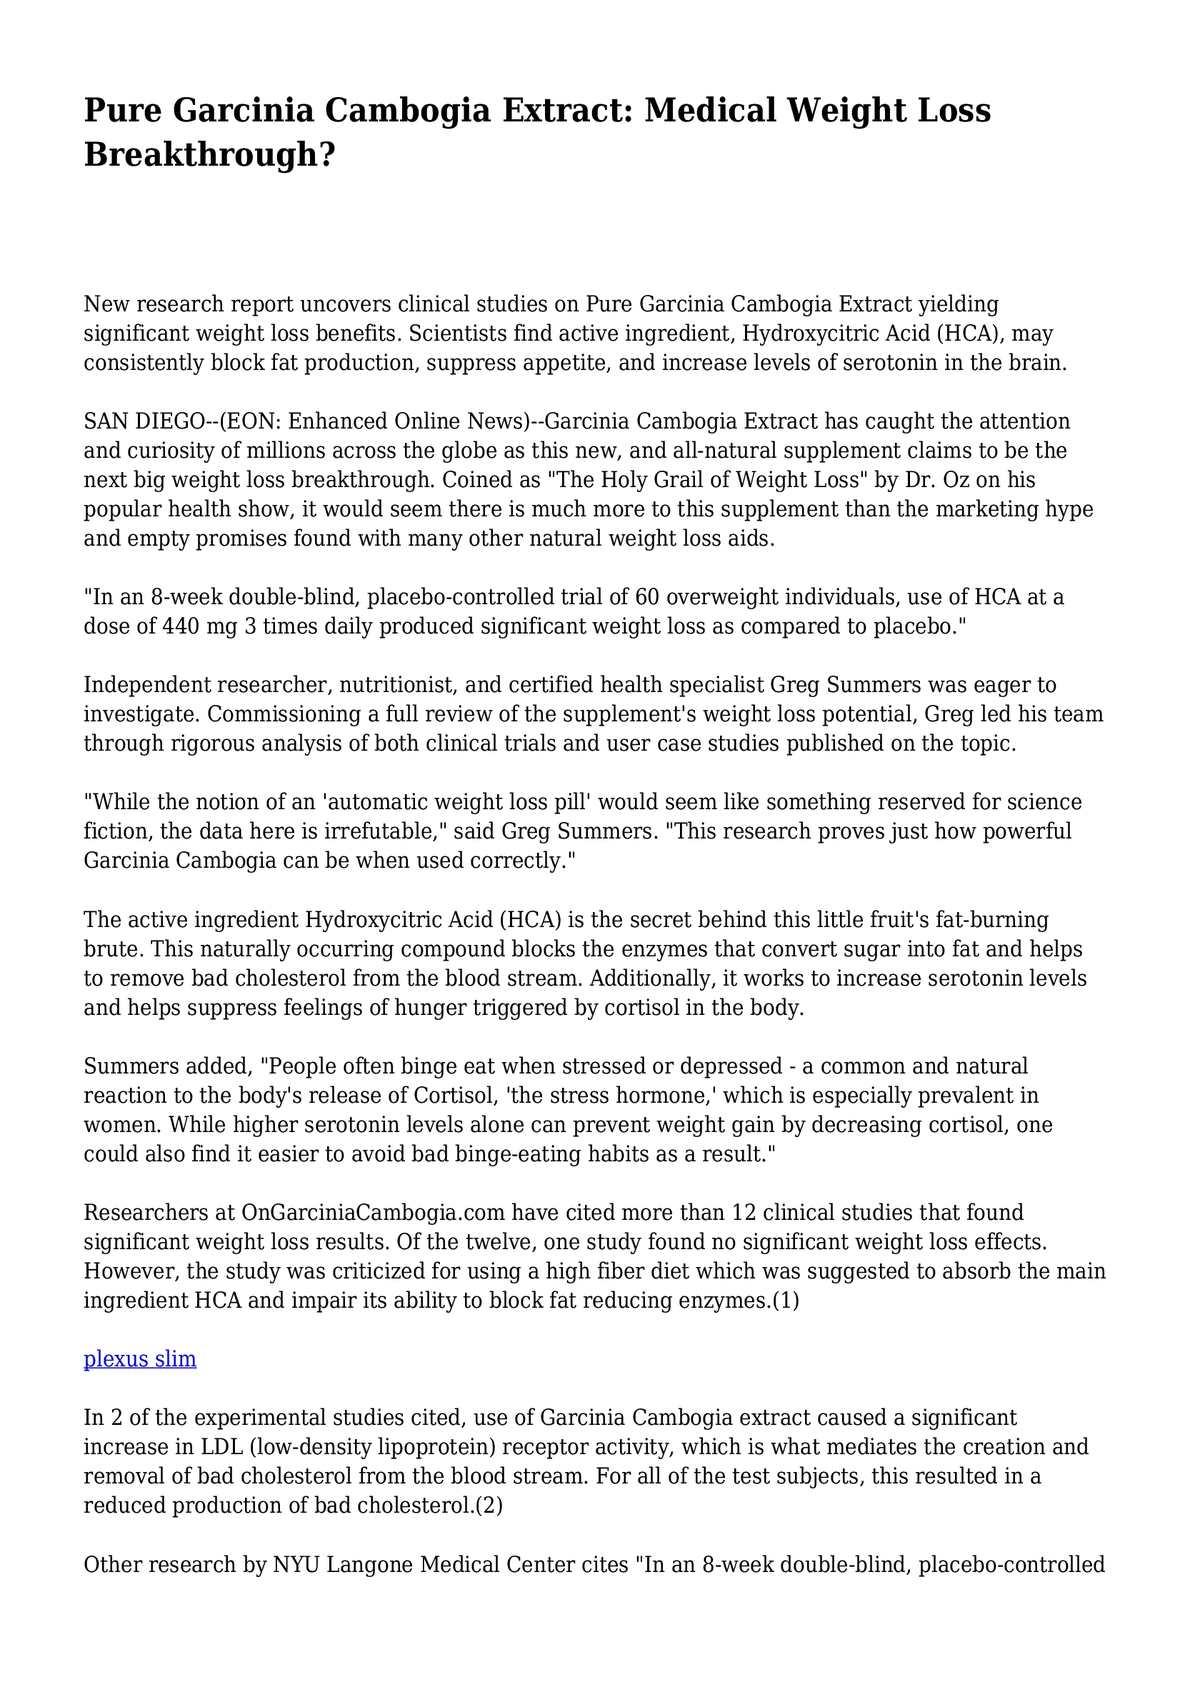 Womens health review of pure garcinia cambogia